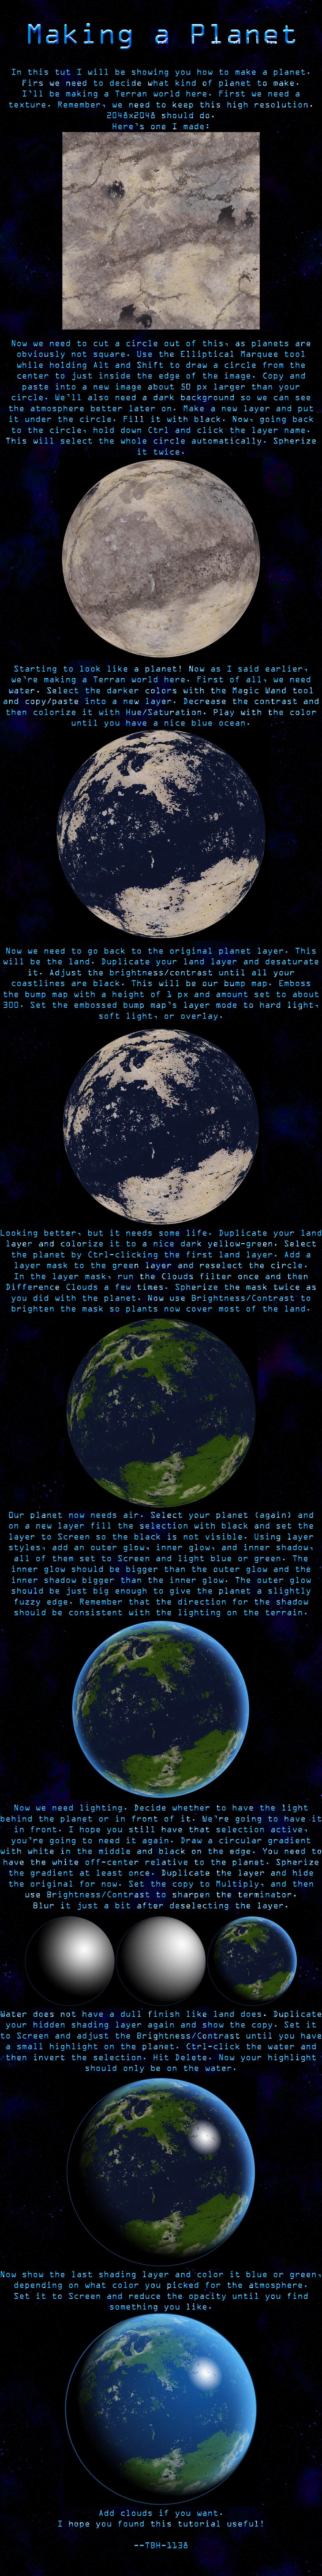 Terran Planet Tutorial by TBH-1138 on DeviantArt